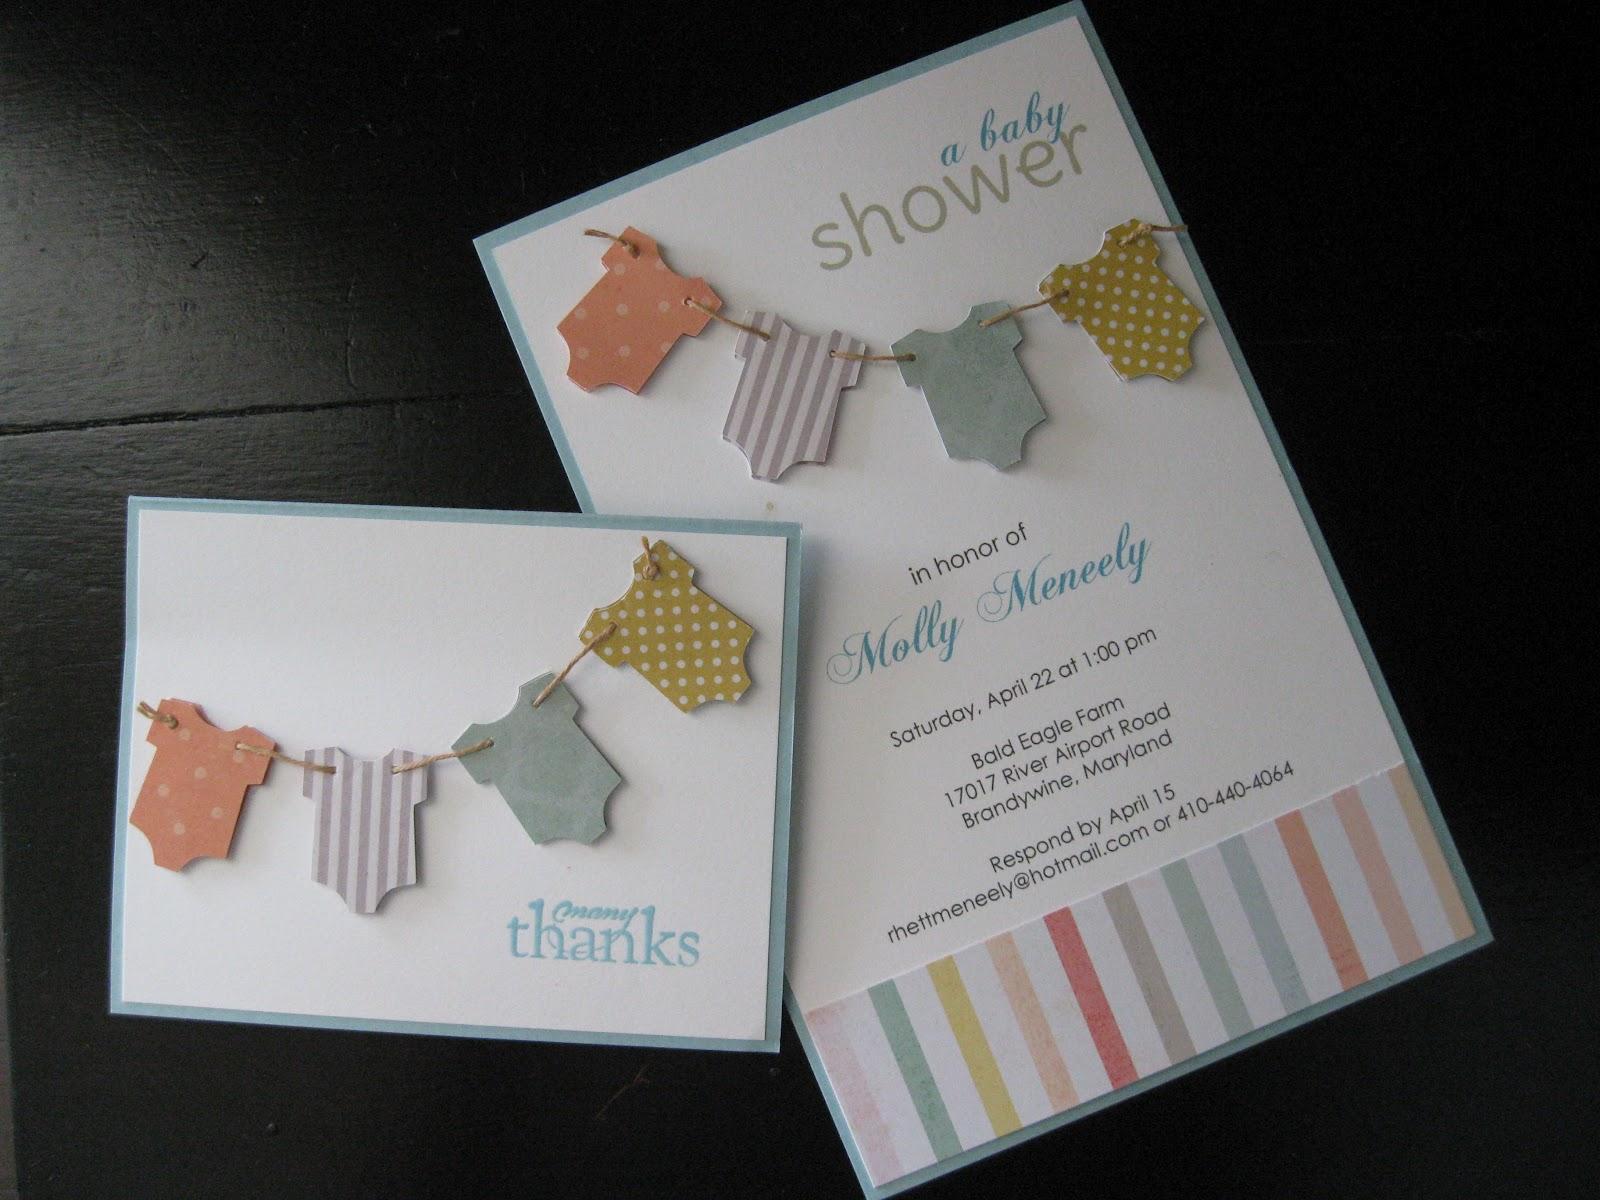 Baby shower invitations my bucket list of crafts recipes and baby shower invitations filmwisefo